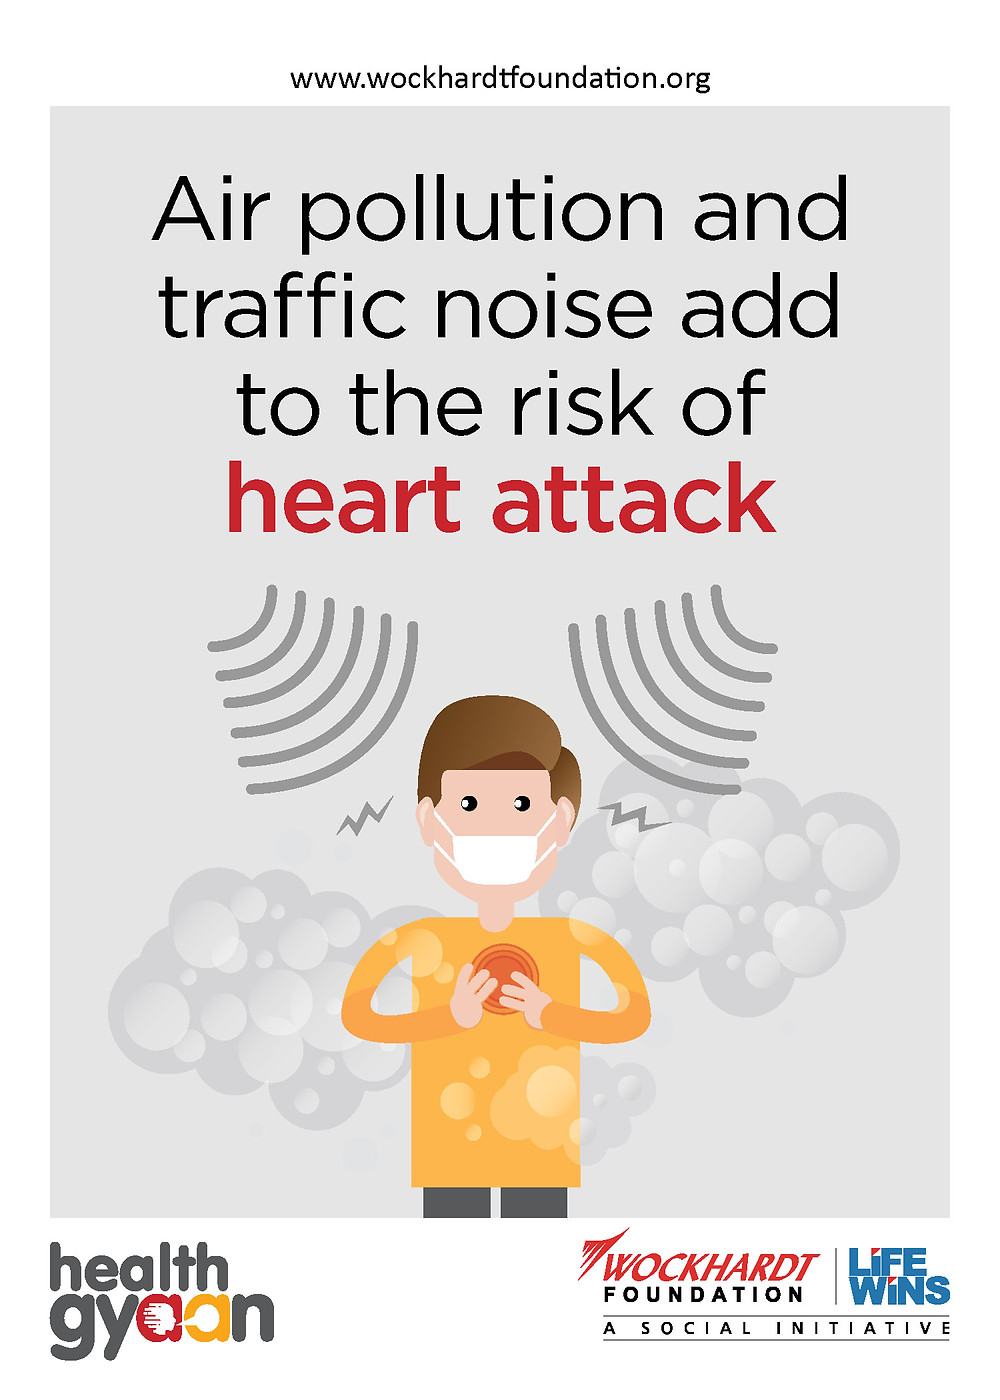 Pollution provokes heart attack